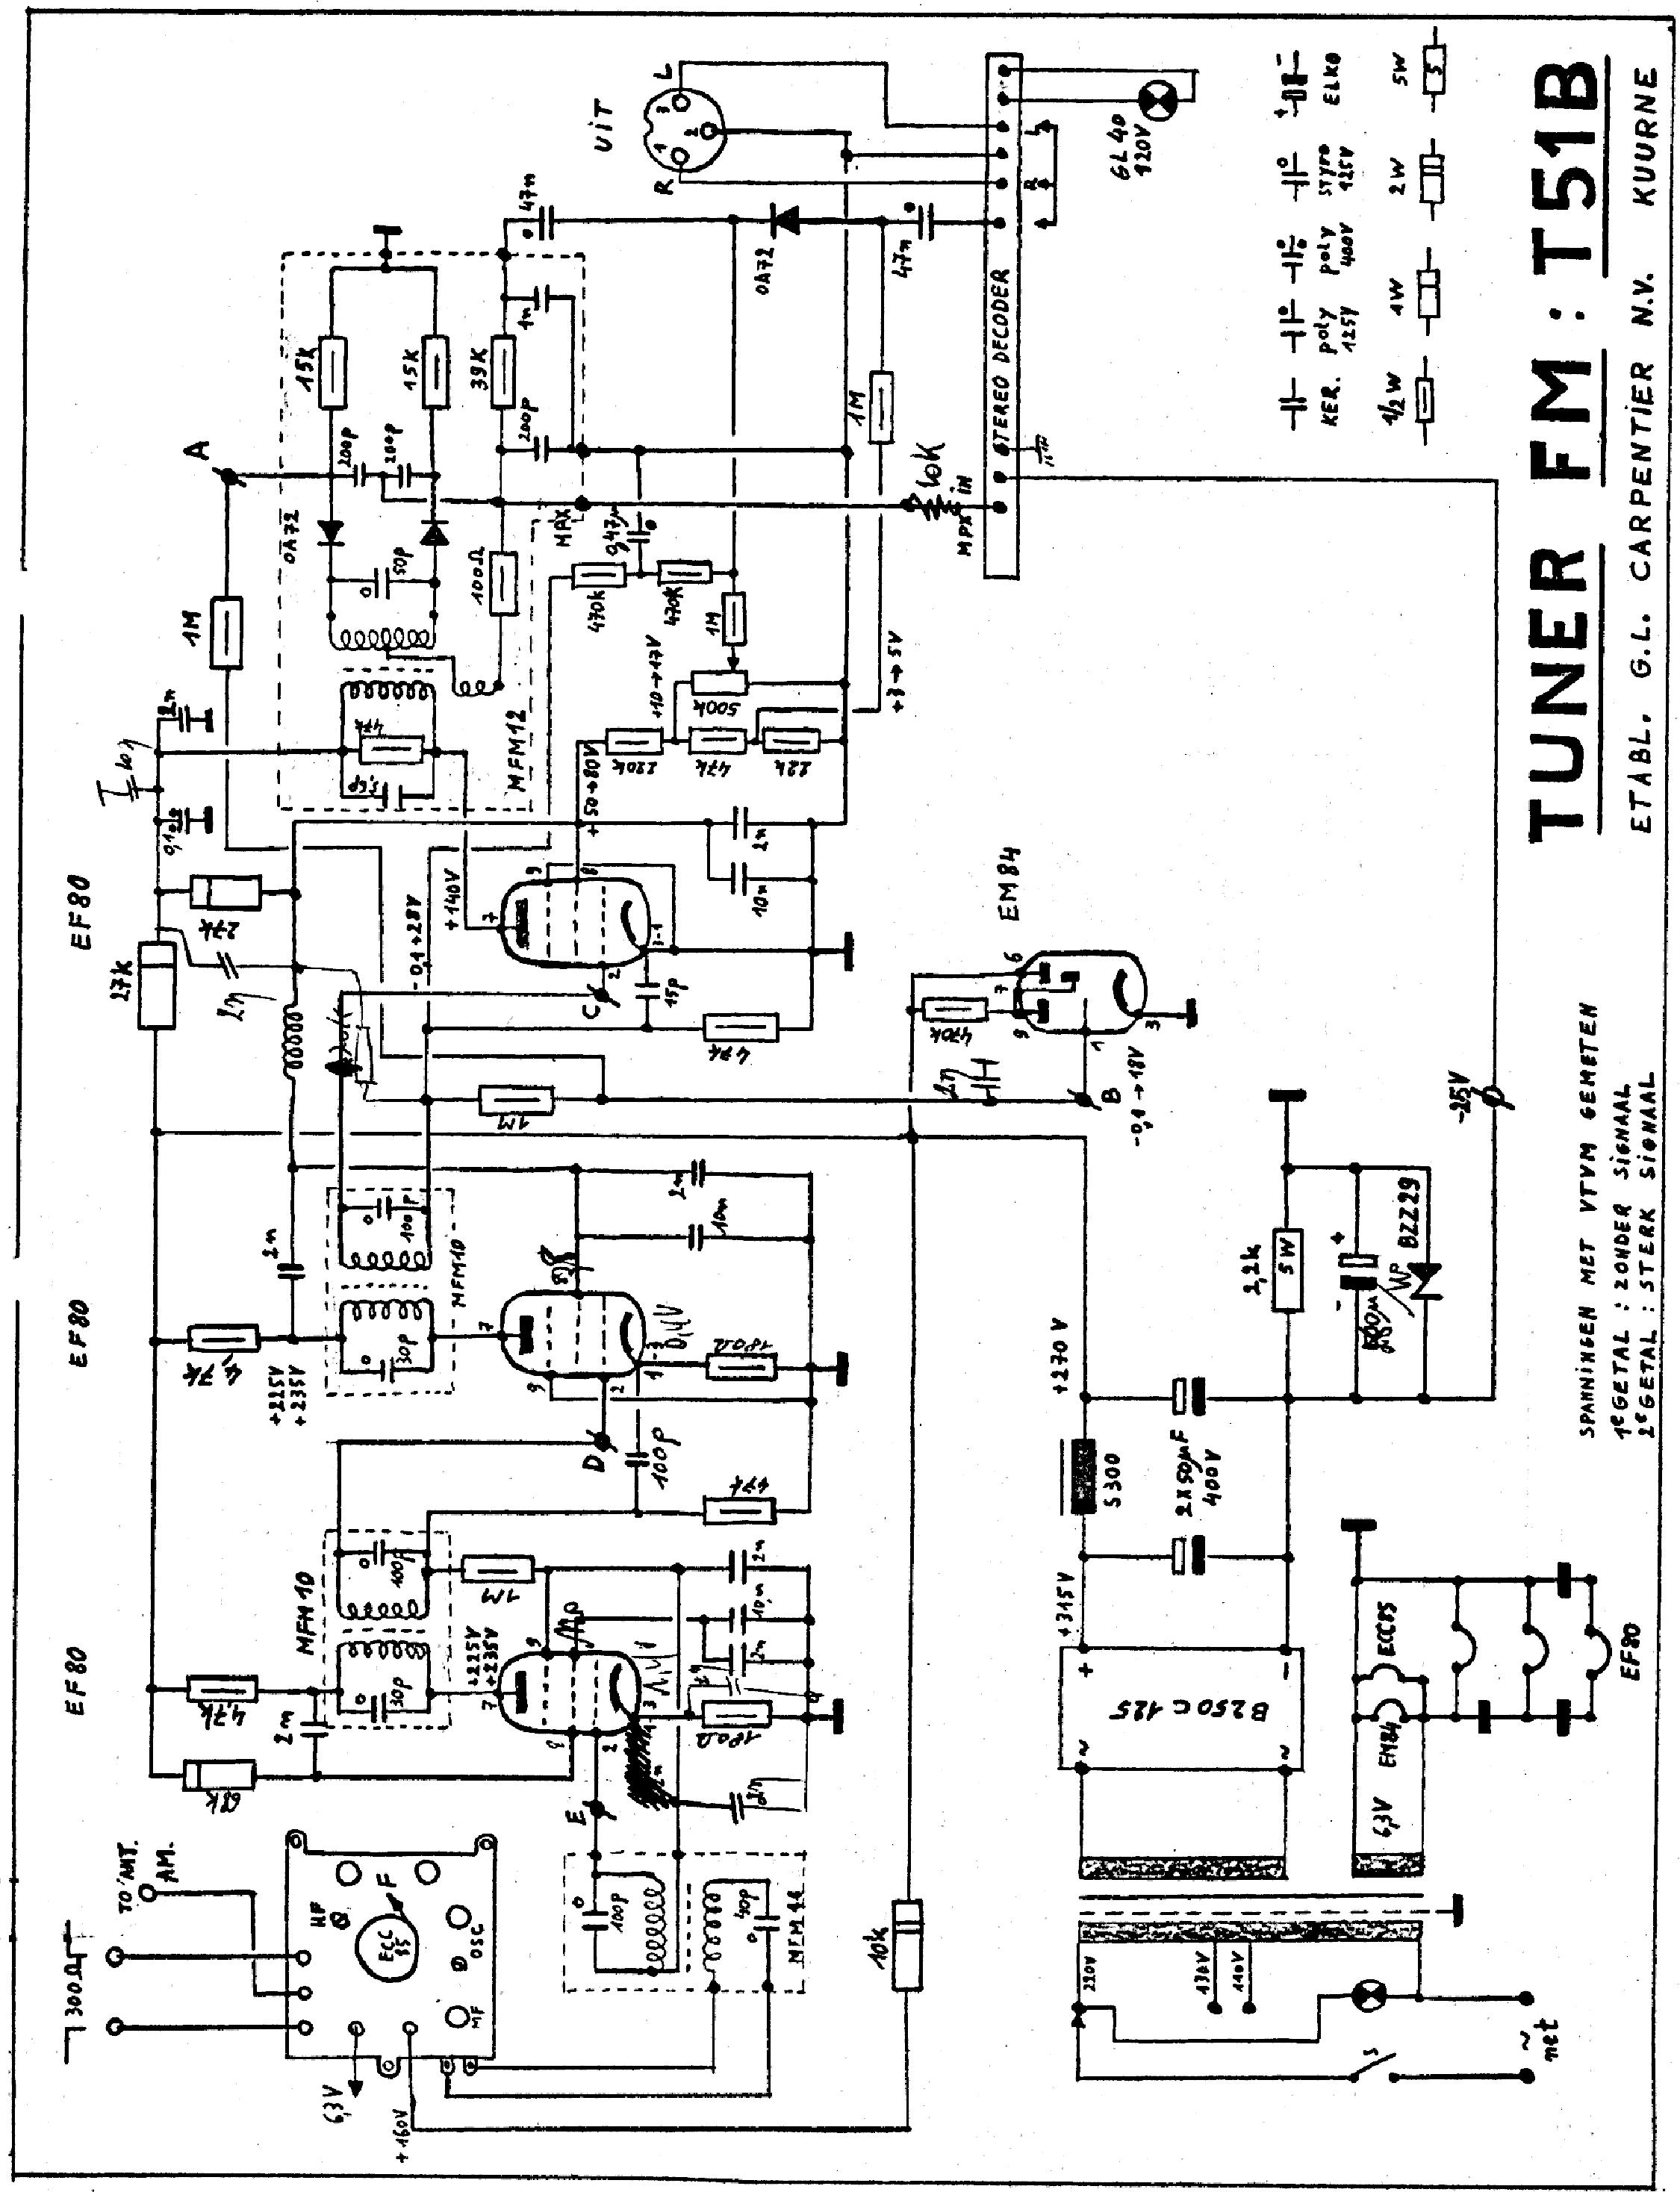 Rare Original Factory Concord Hes 35 Am Fm Stereo Receiver Service Block Diagram Radio Pdf All Kind Of Wiring Diagrams